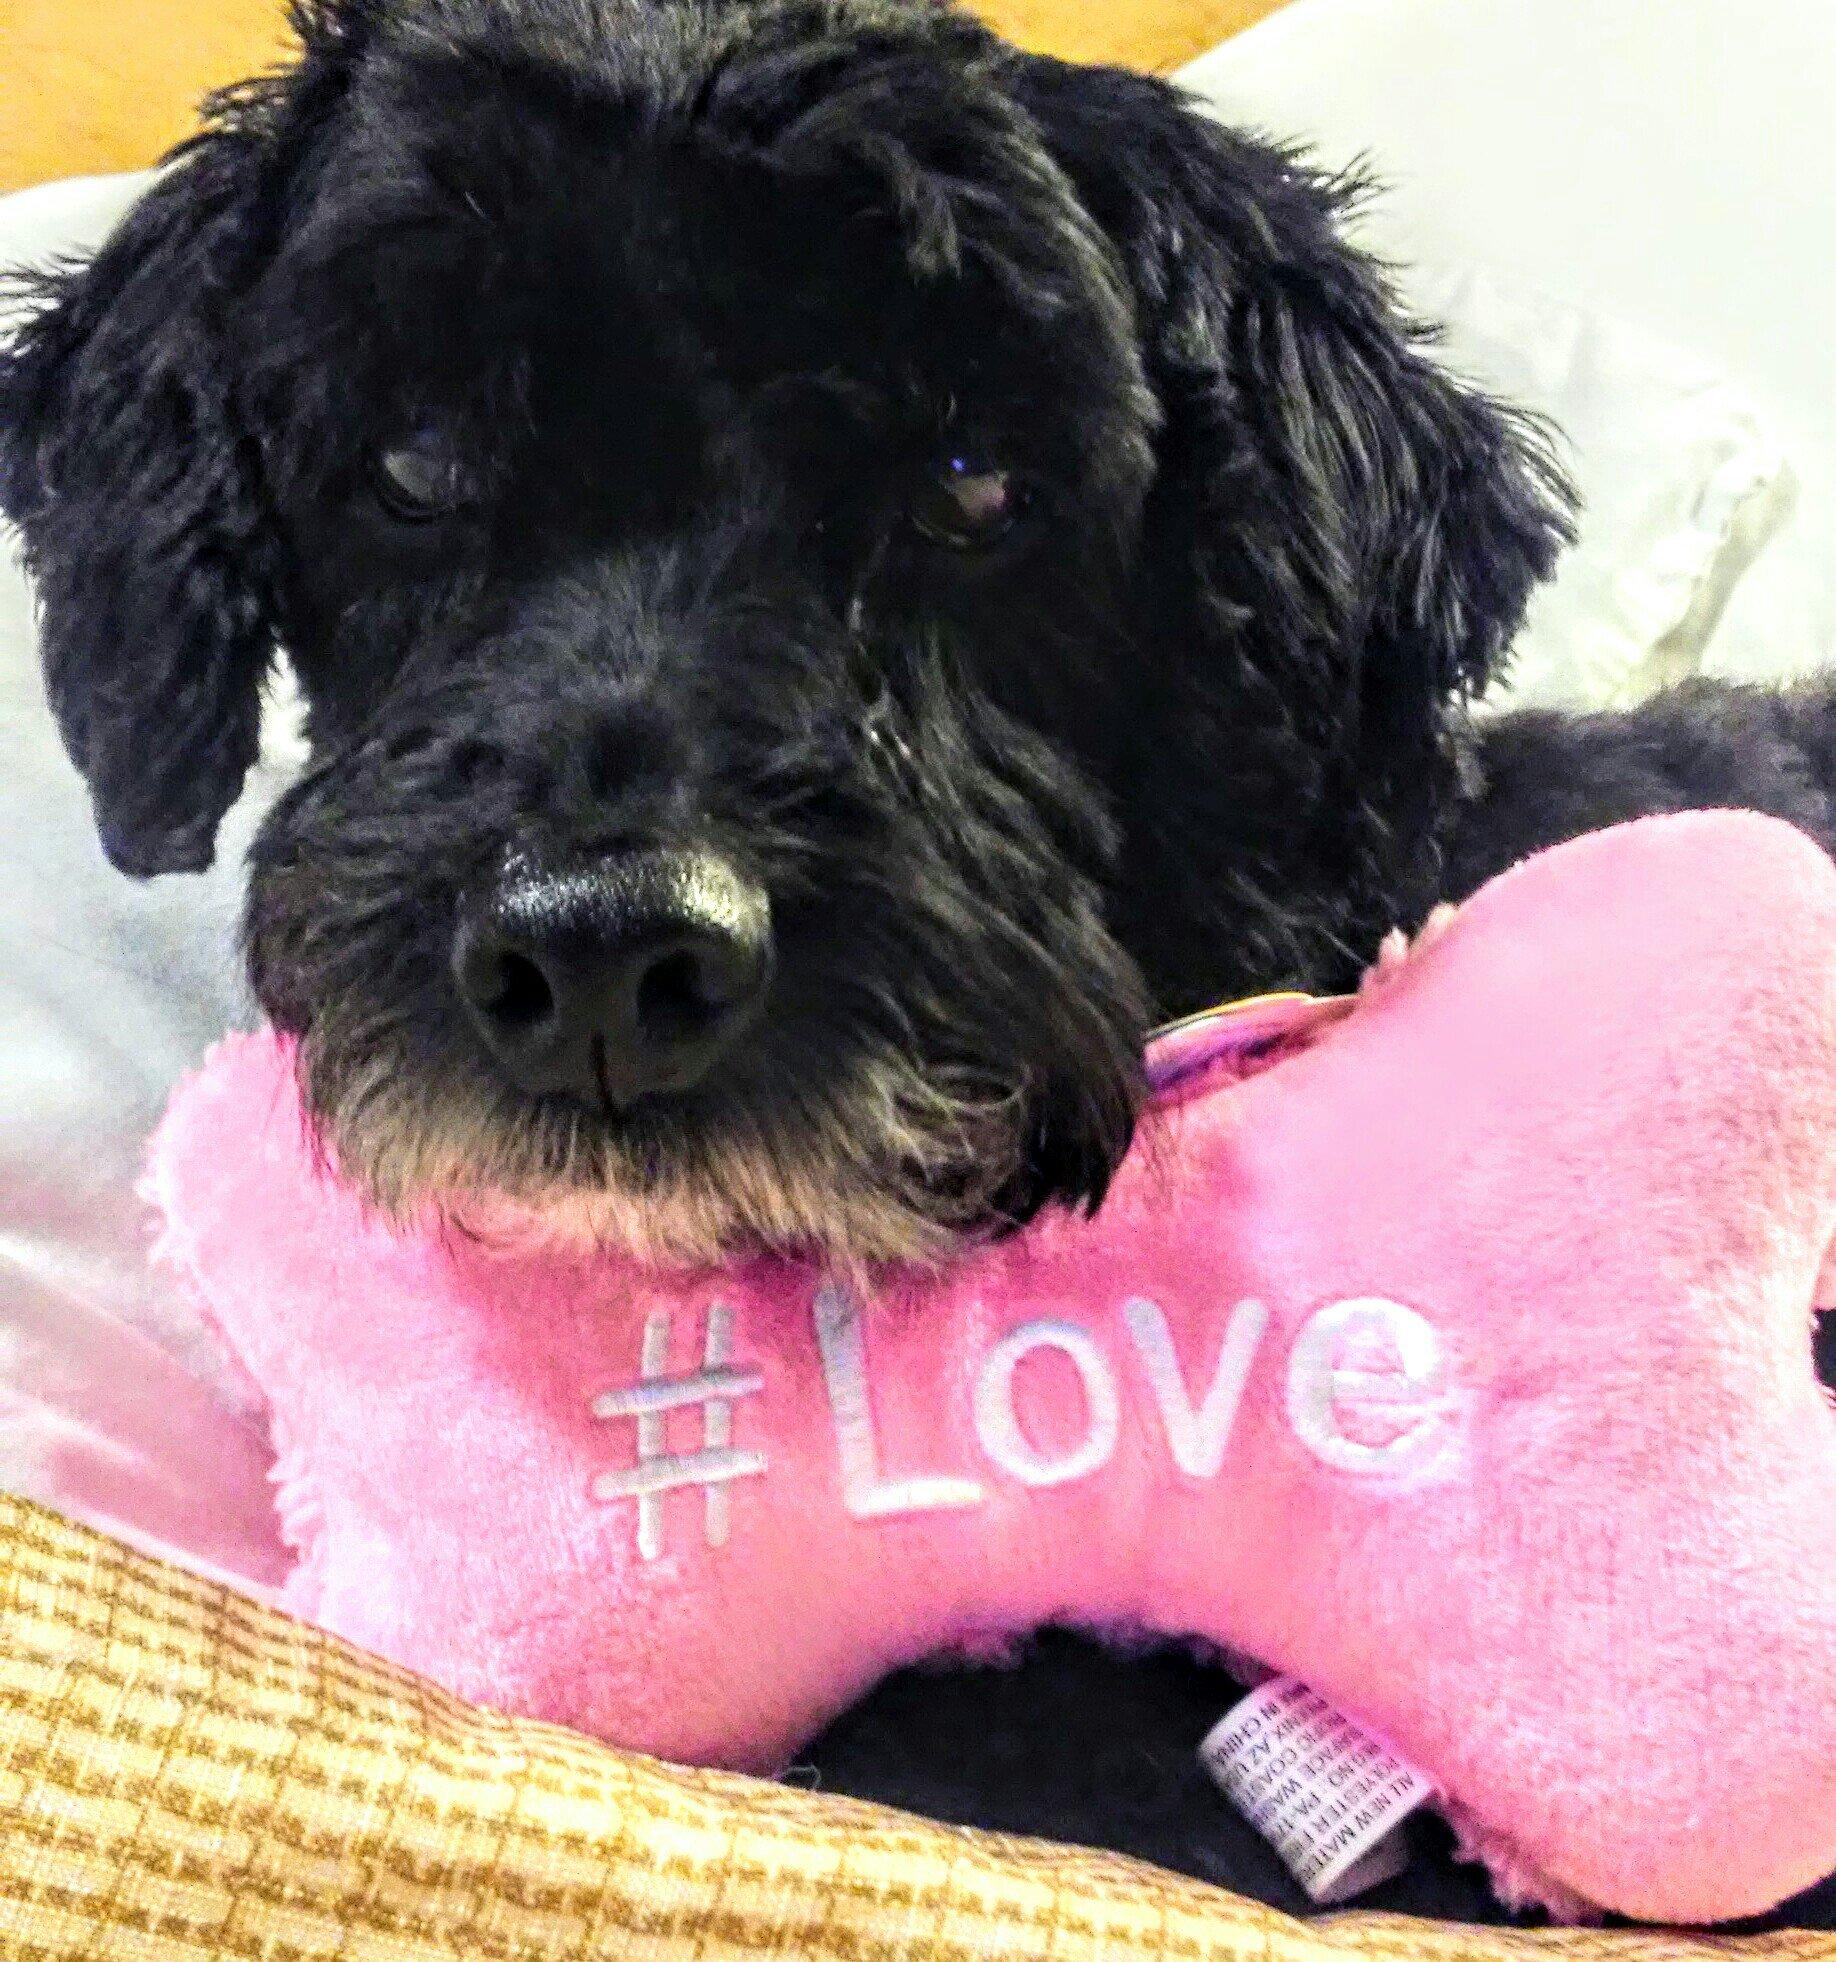 beautiful black terrier dog with stuffed pink bone dog toy